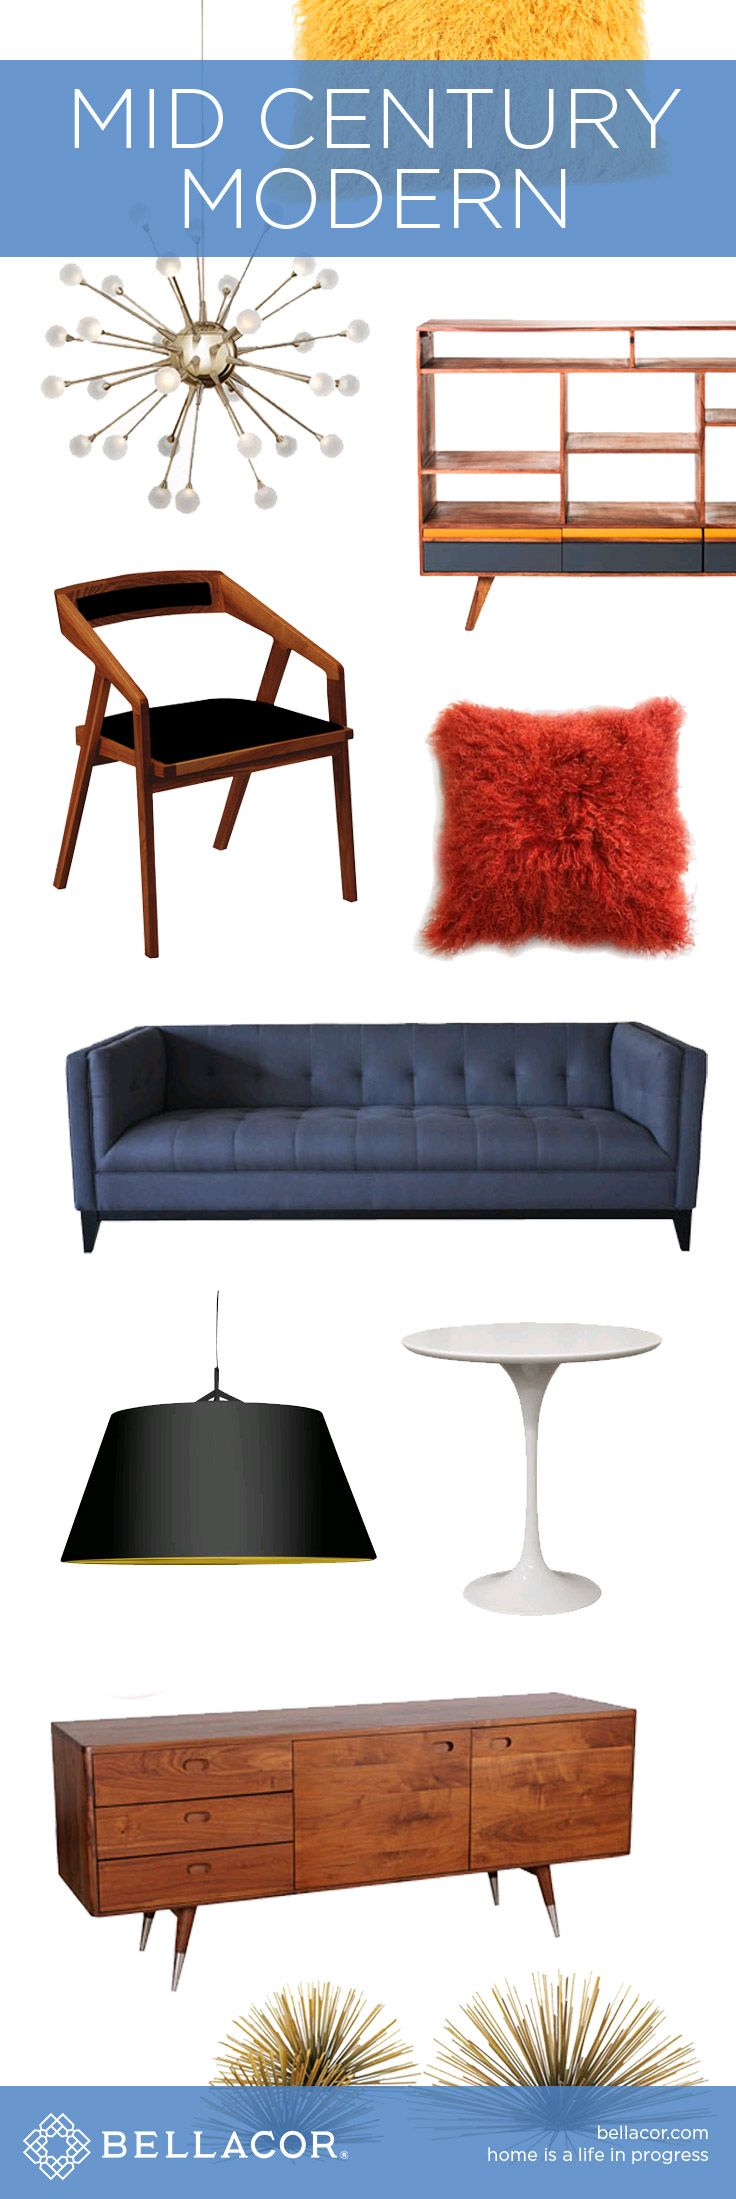 Mid century modern furniture lighting and home decor bellacor